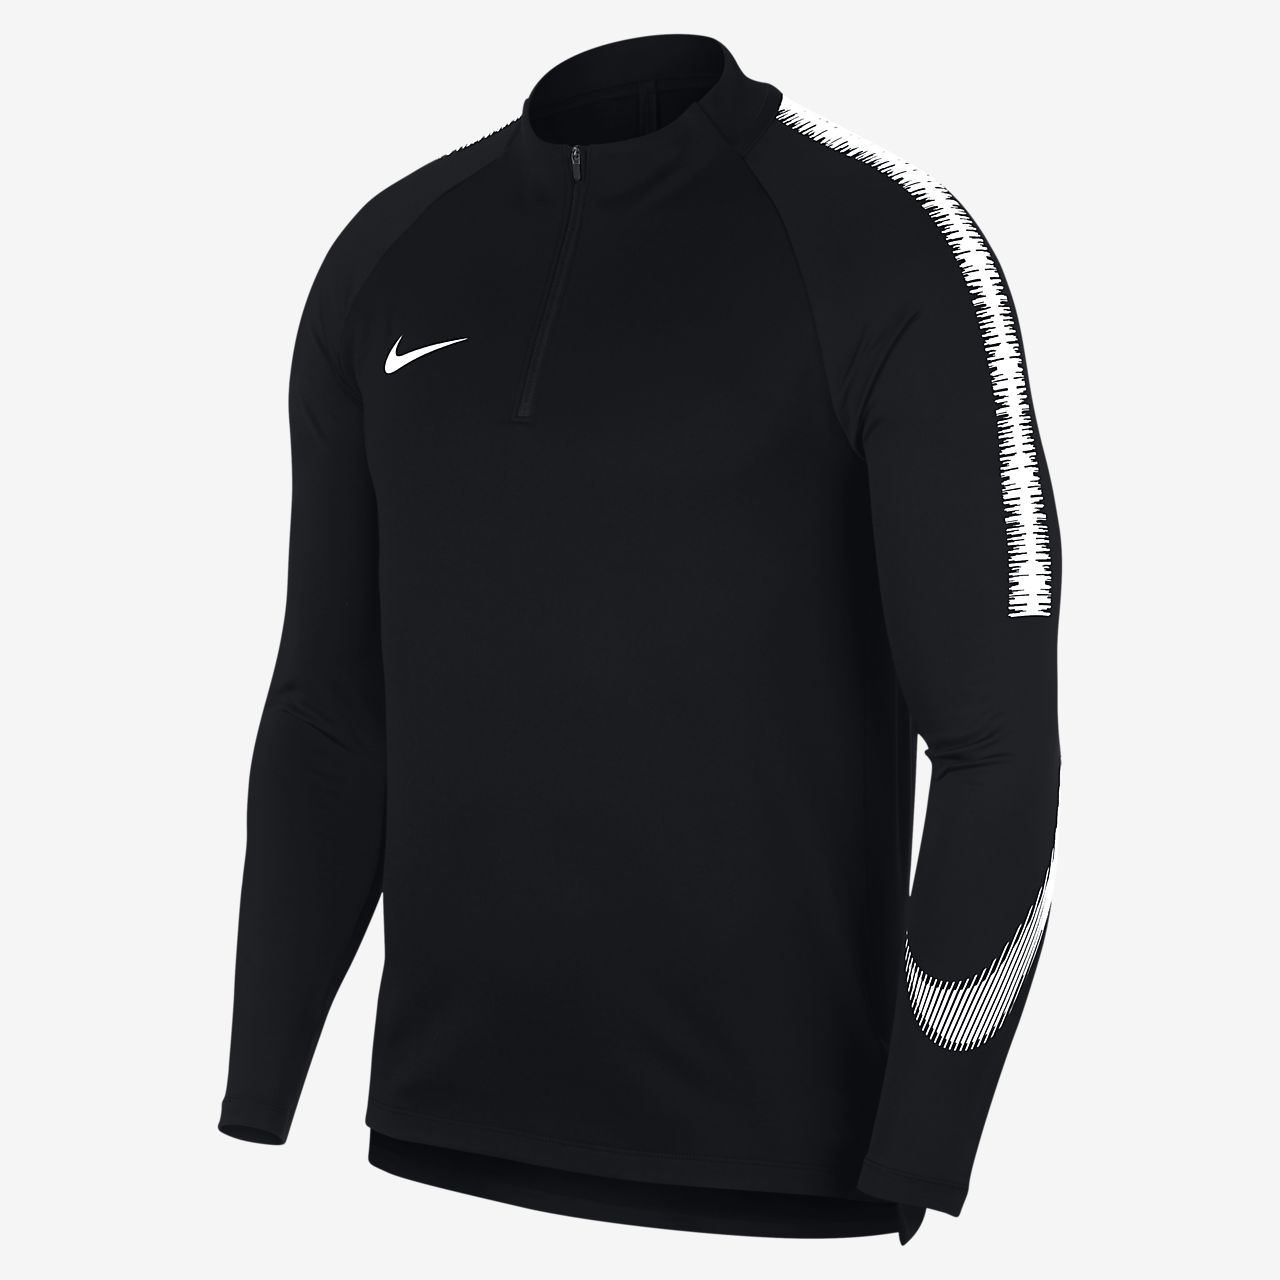 Långärmad fotbollströja Nike Dri-FIT Squad Drill för män